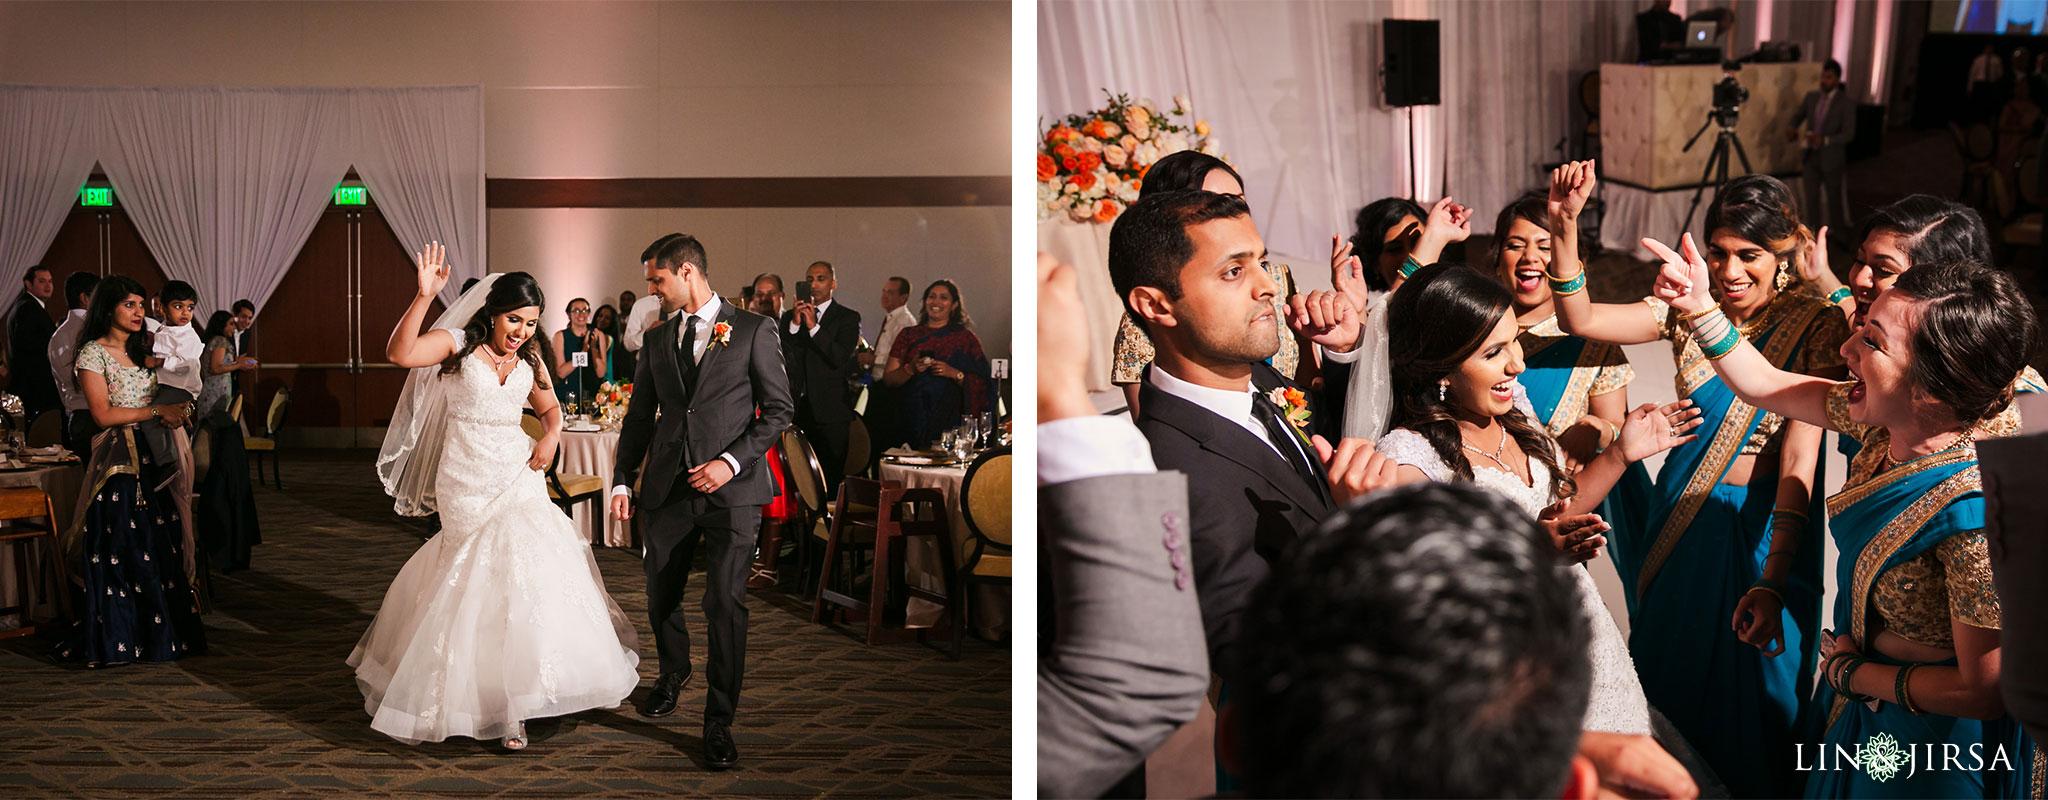 32 sheraton fairplex inland empire indian wedding photography